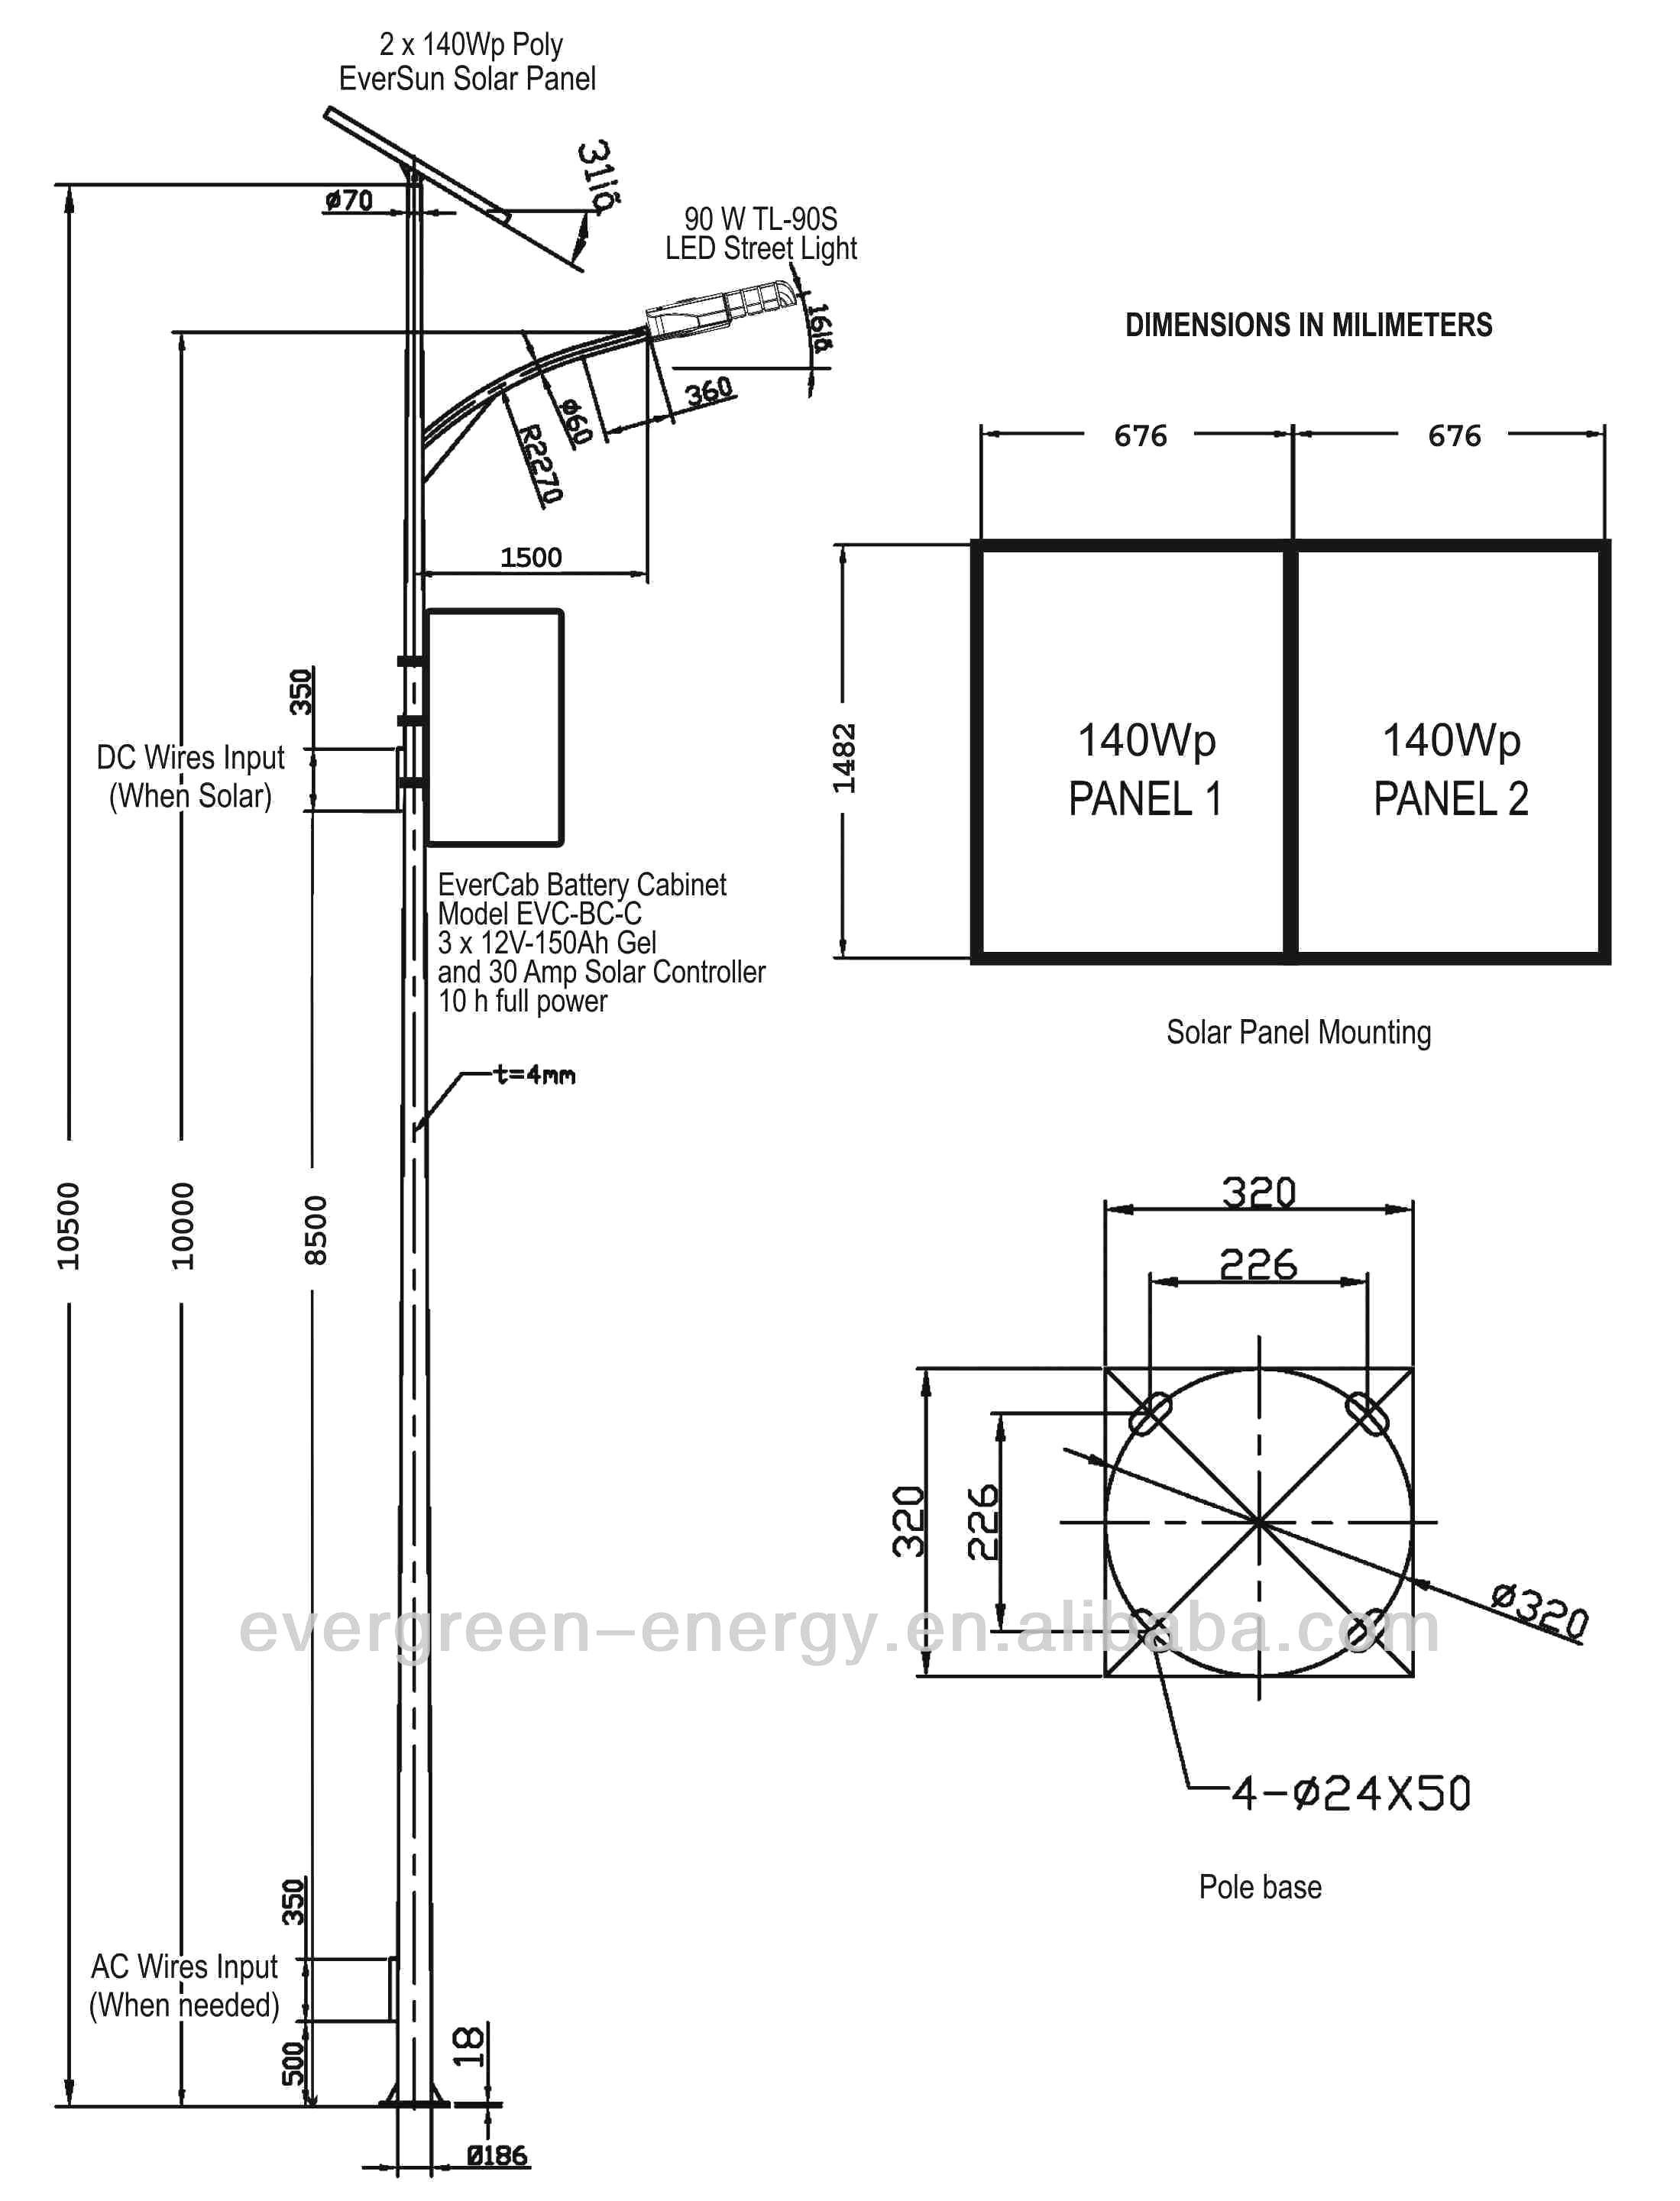 solar powered light wiring diagram vw polo 6n2 car circuit diesel generator control panel